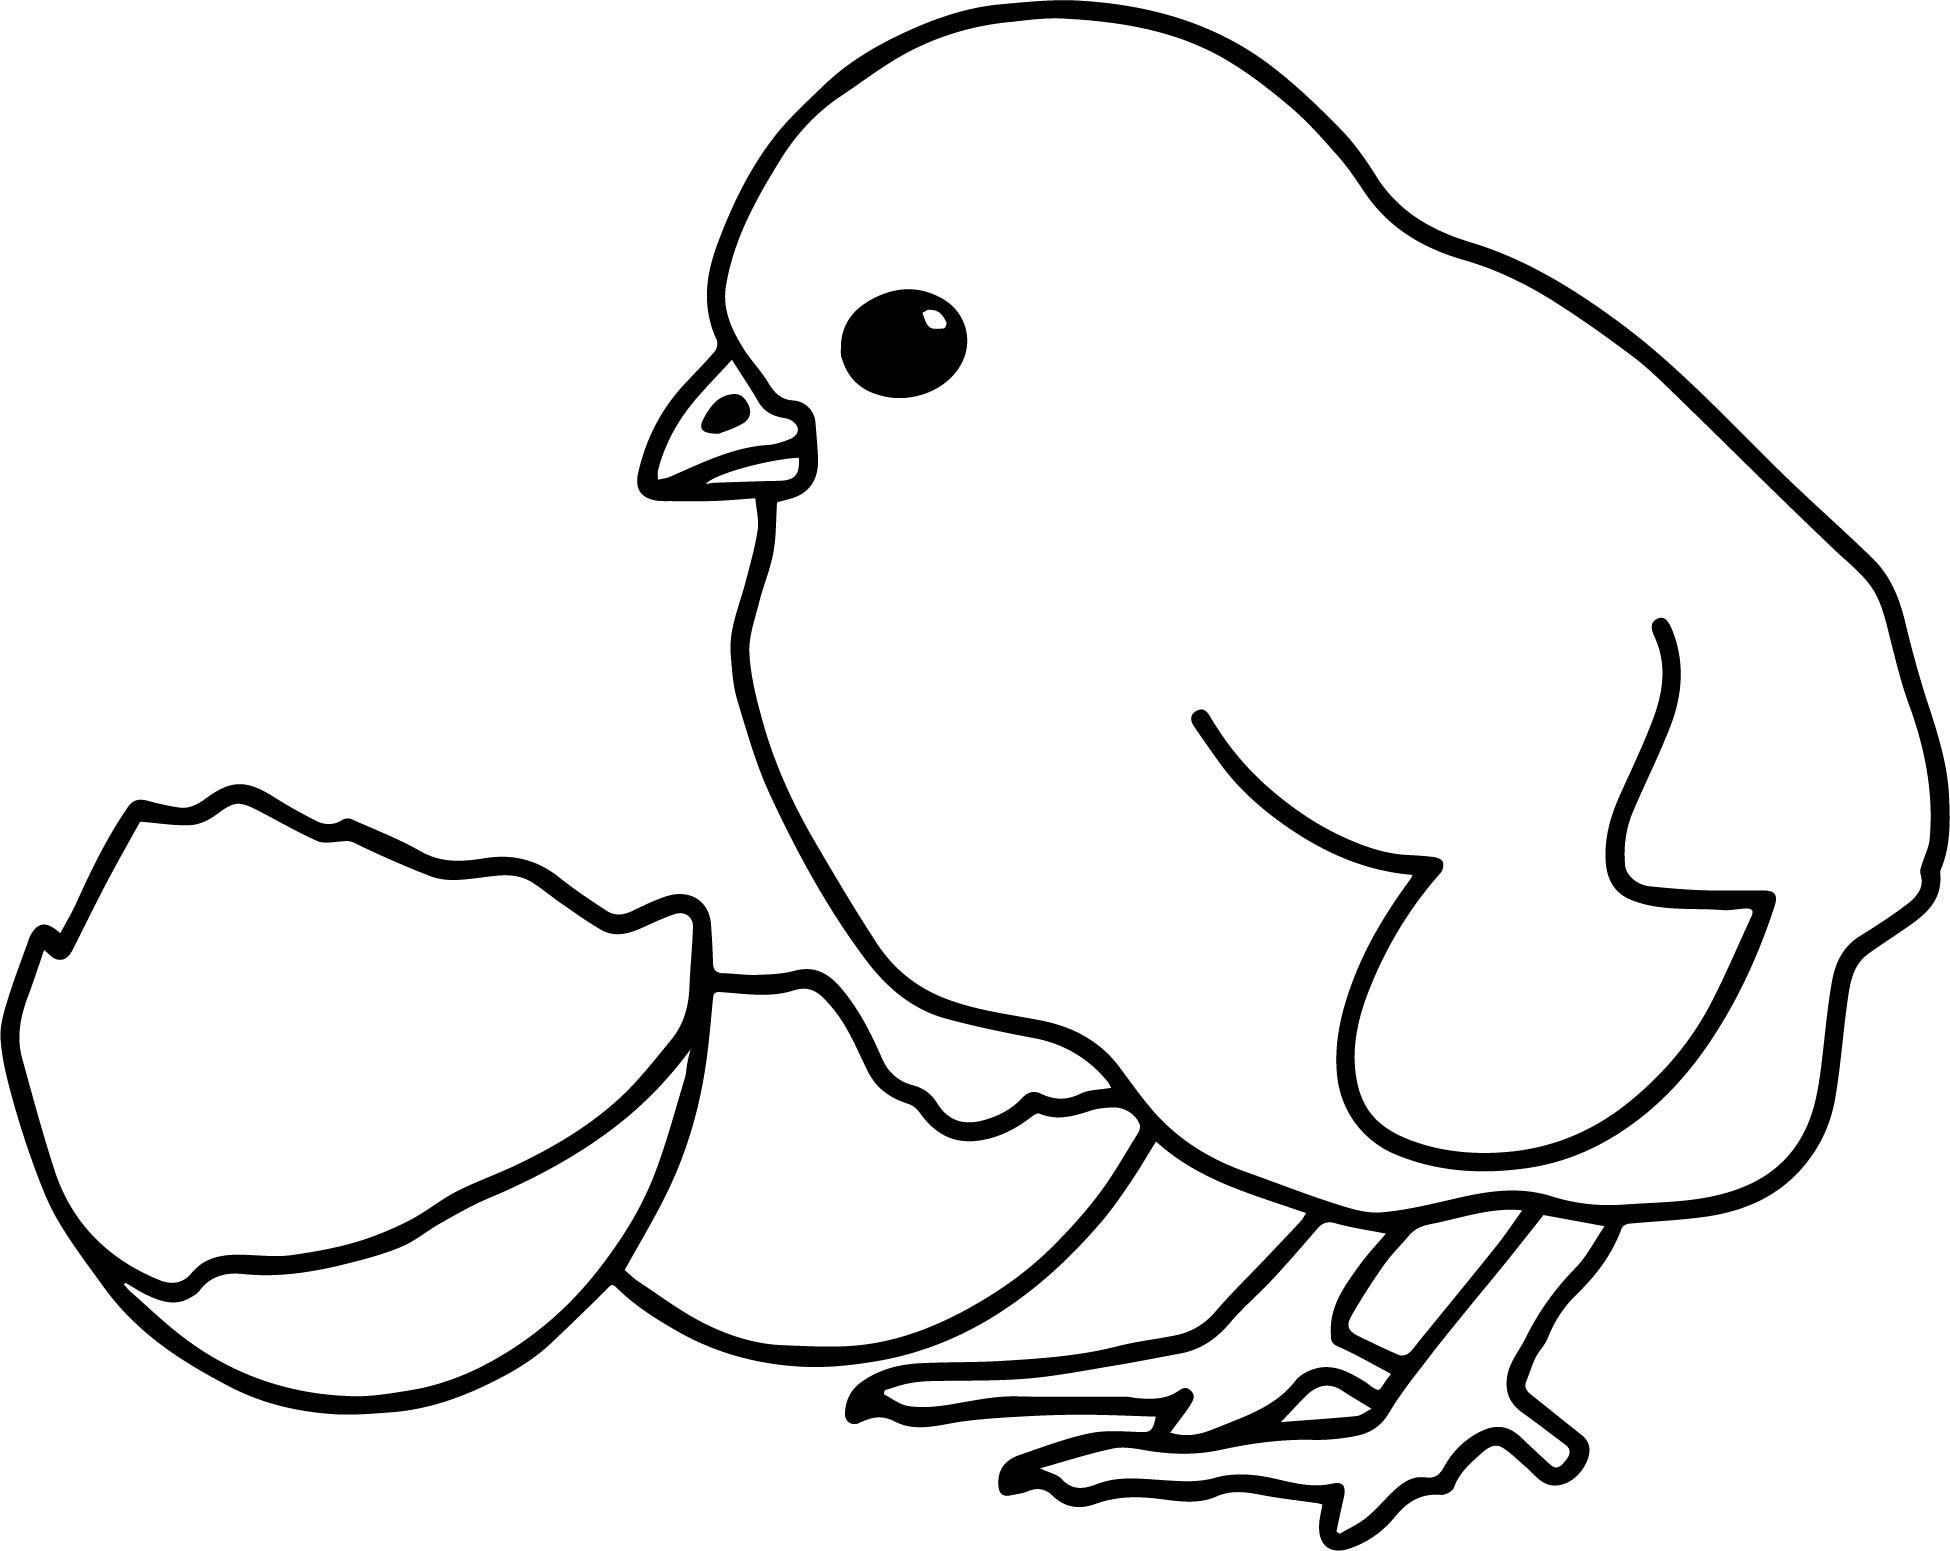 Baby Farm Animal Chicken Coloring Page